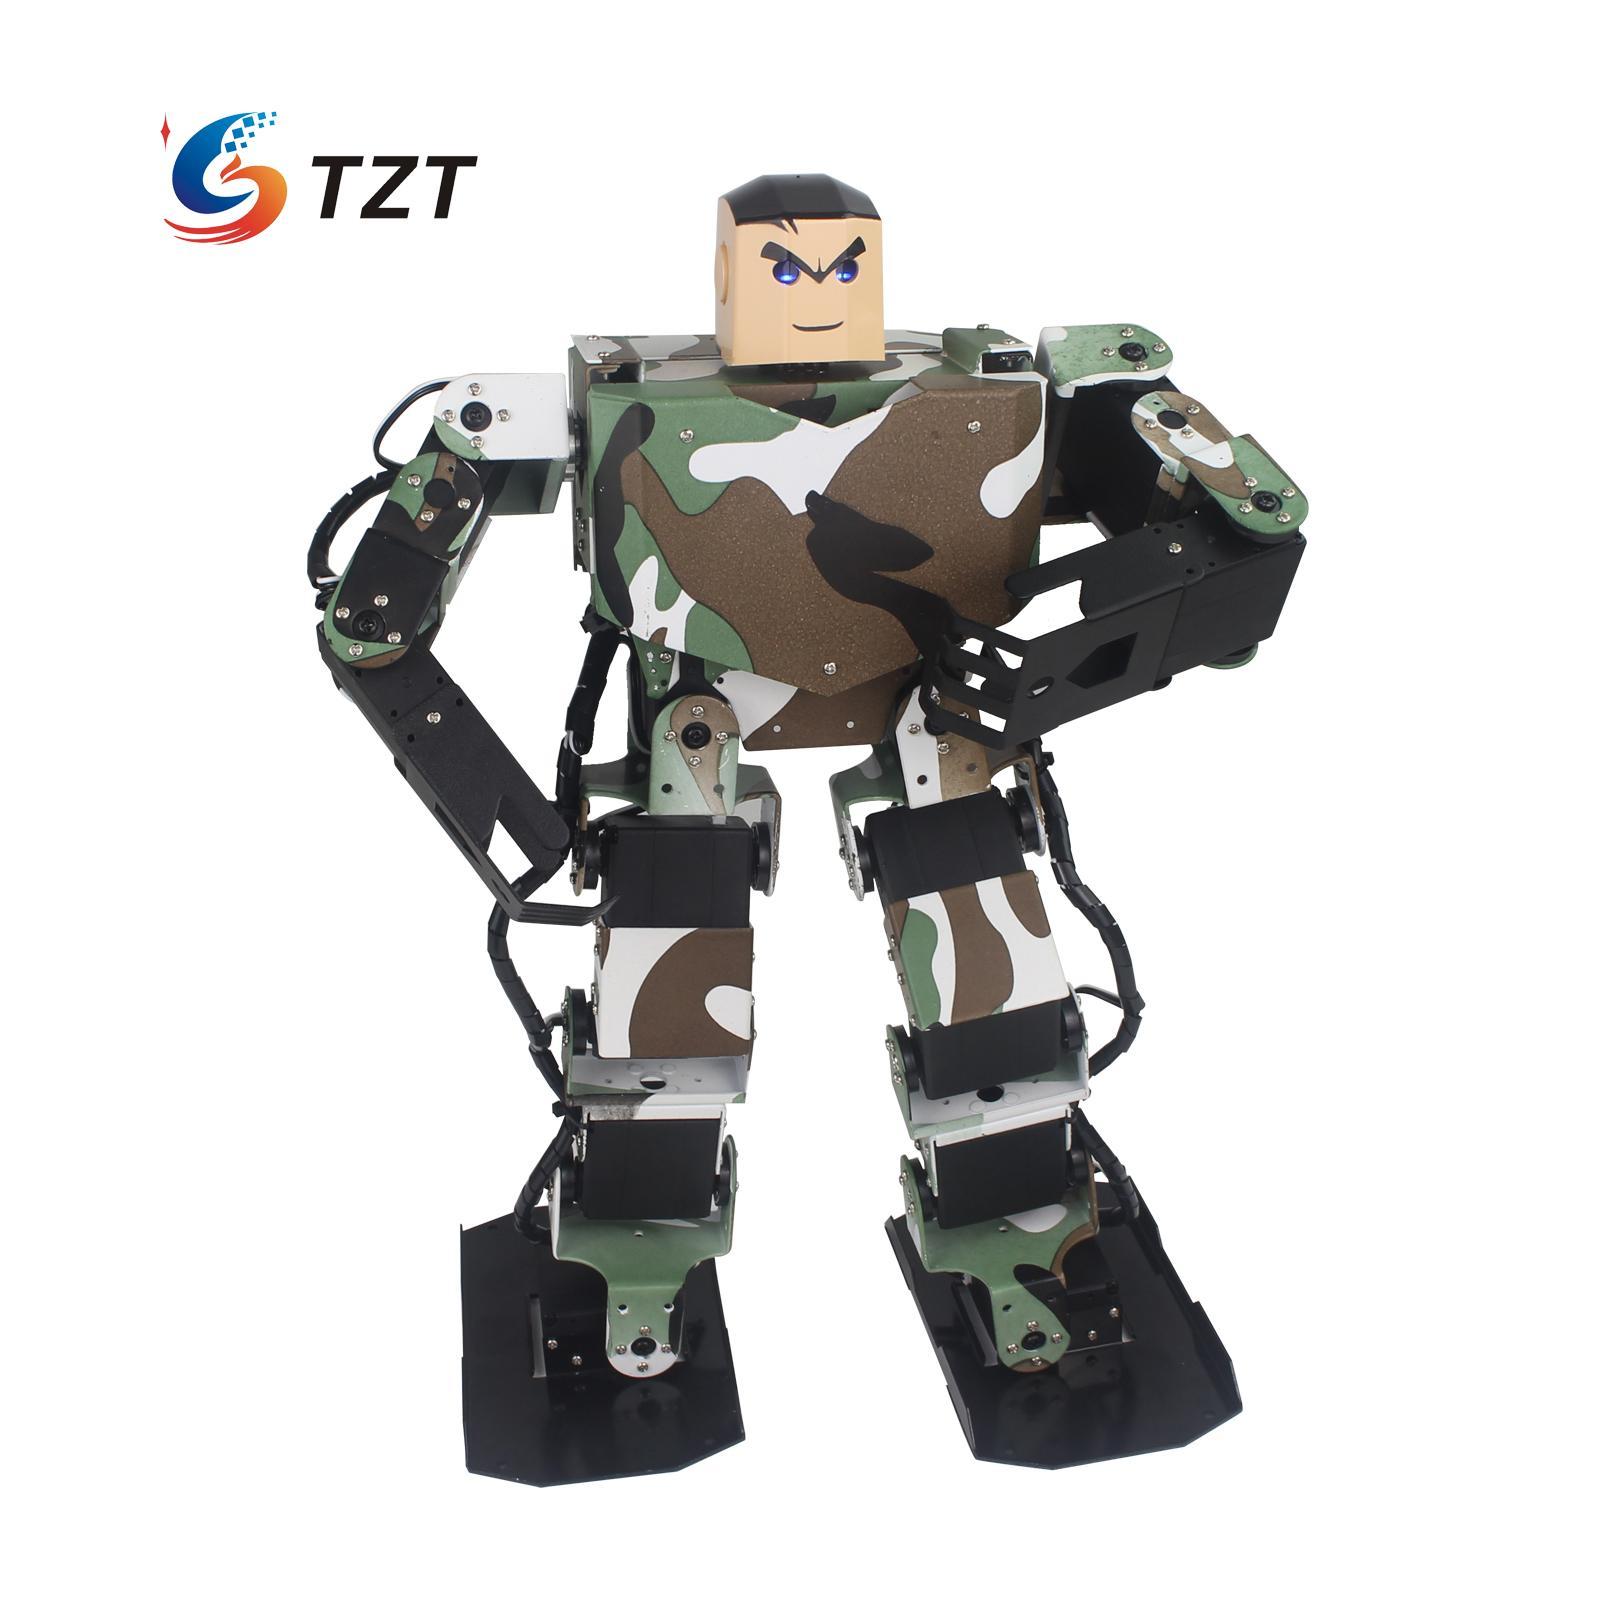 Soldier King 16DOF Smart Humanoid Robot Contest Dance Programmable Biped Robotics with Servos/Handle/Controller Assembled шланг подающий gardena 1 25мм 25м 02792 20 000 00